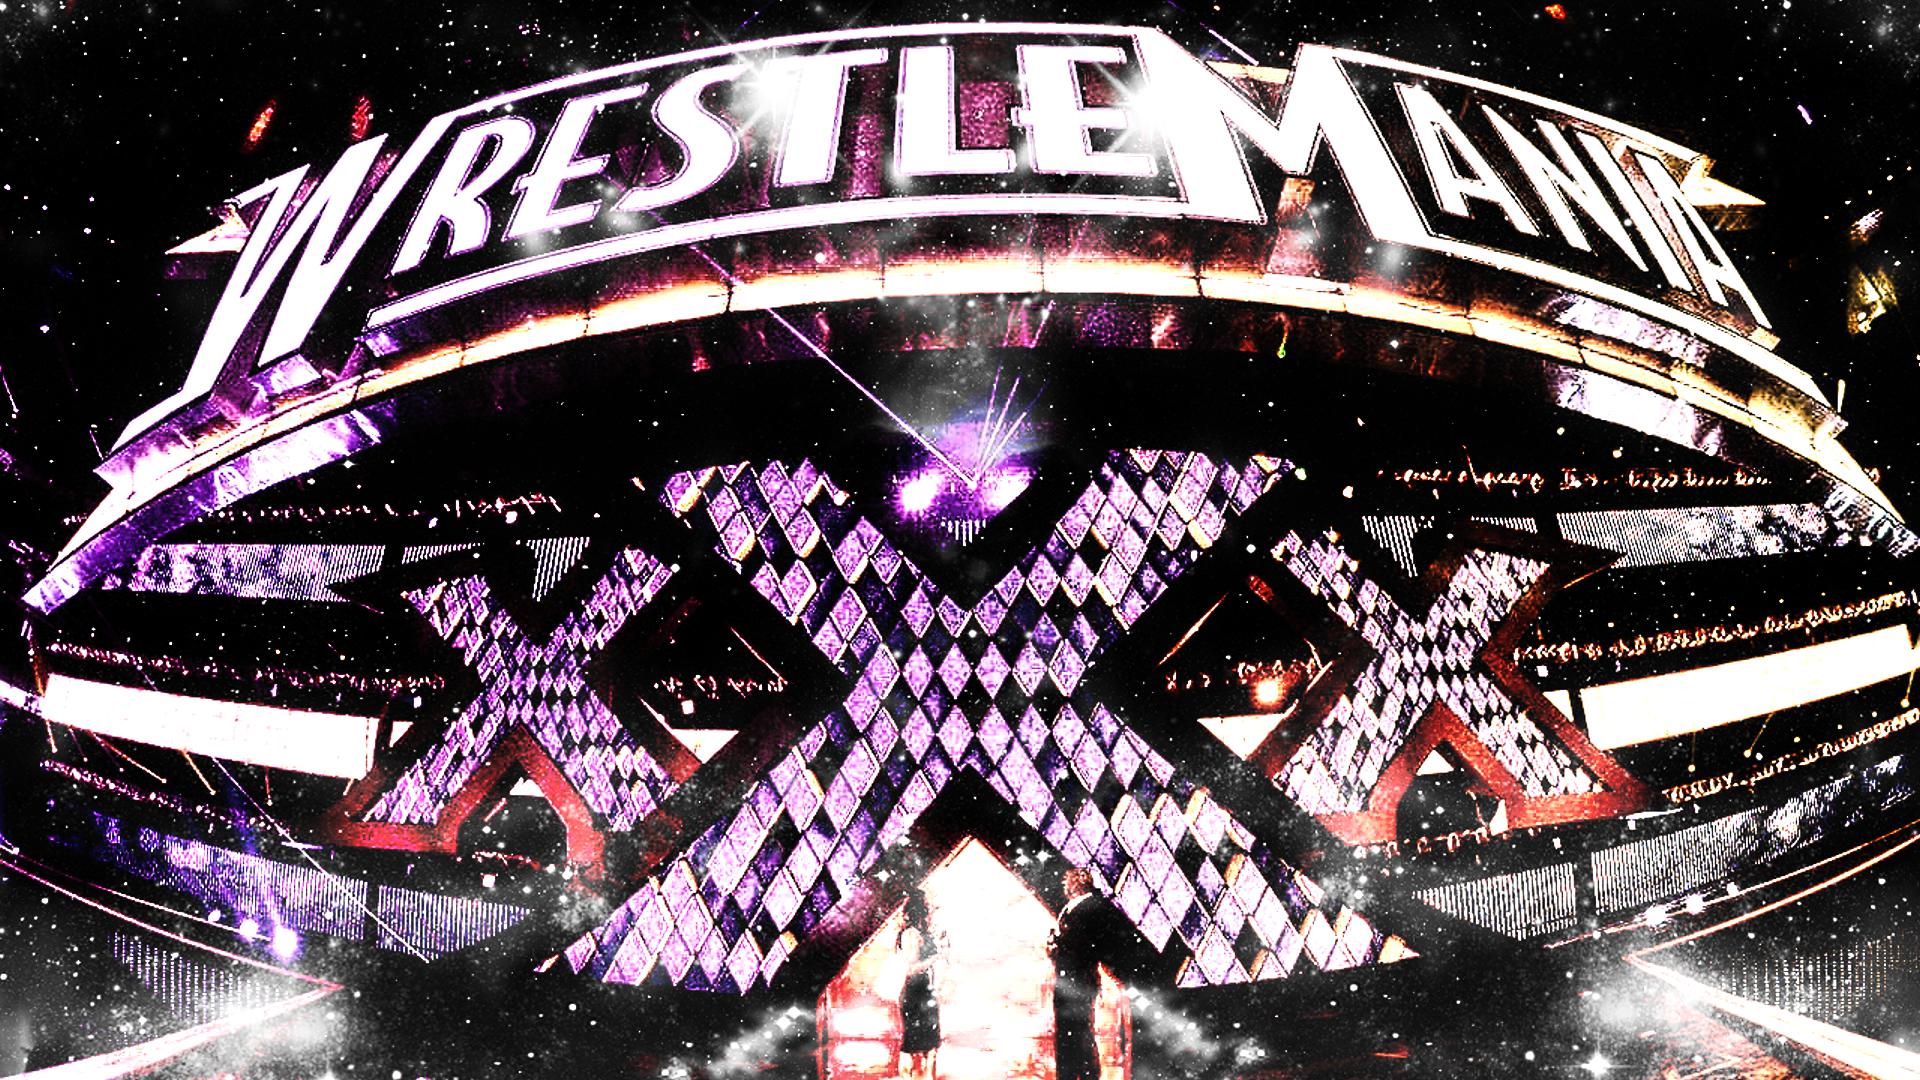 Wwe Wrestlemania 30 Header1 Png 1 920 1 080 Pixels Wrestlemania Wwe Wwe News